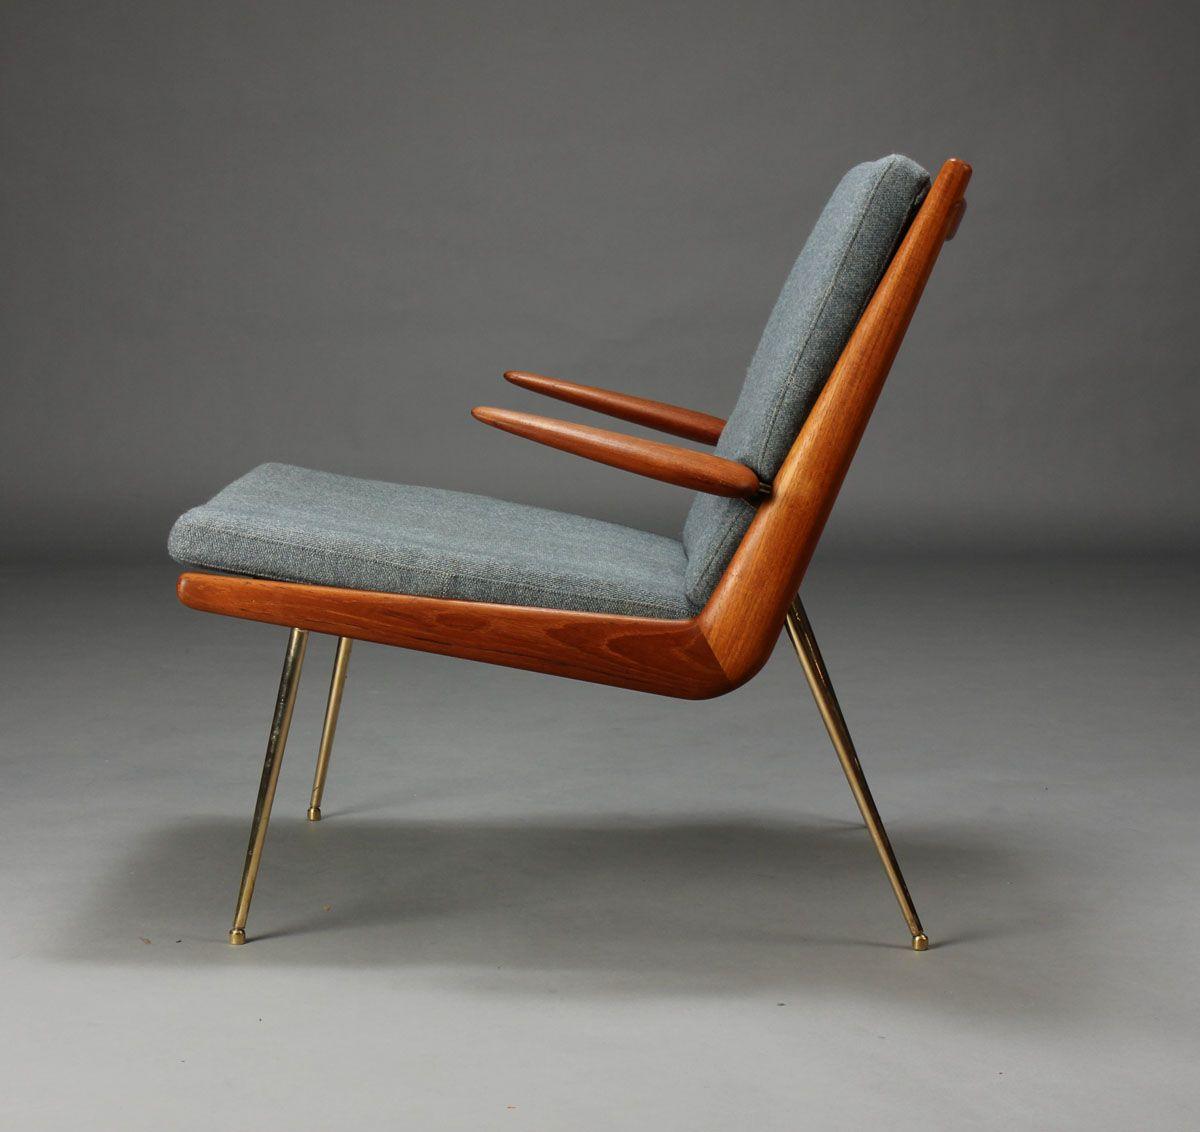 Lounge Stoel Retro.17 Splendid Retro Chair Designs That Are Worth Having Retro